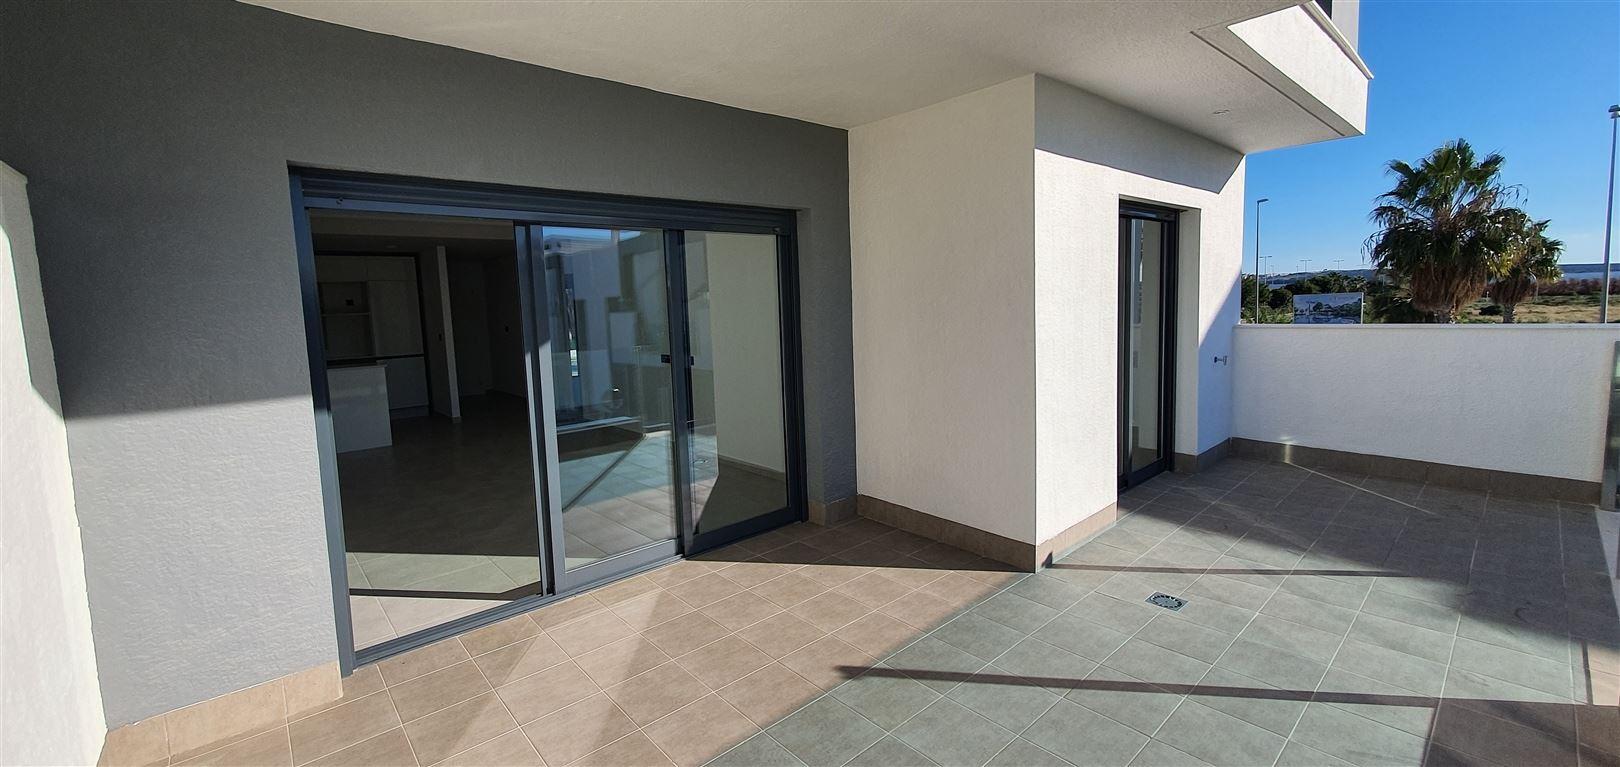 Foto 9 : Appartement te  GUARDAMAR (Spanje) - Prijs € 184.900